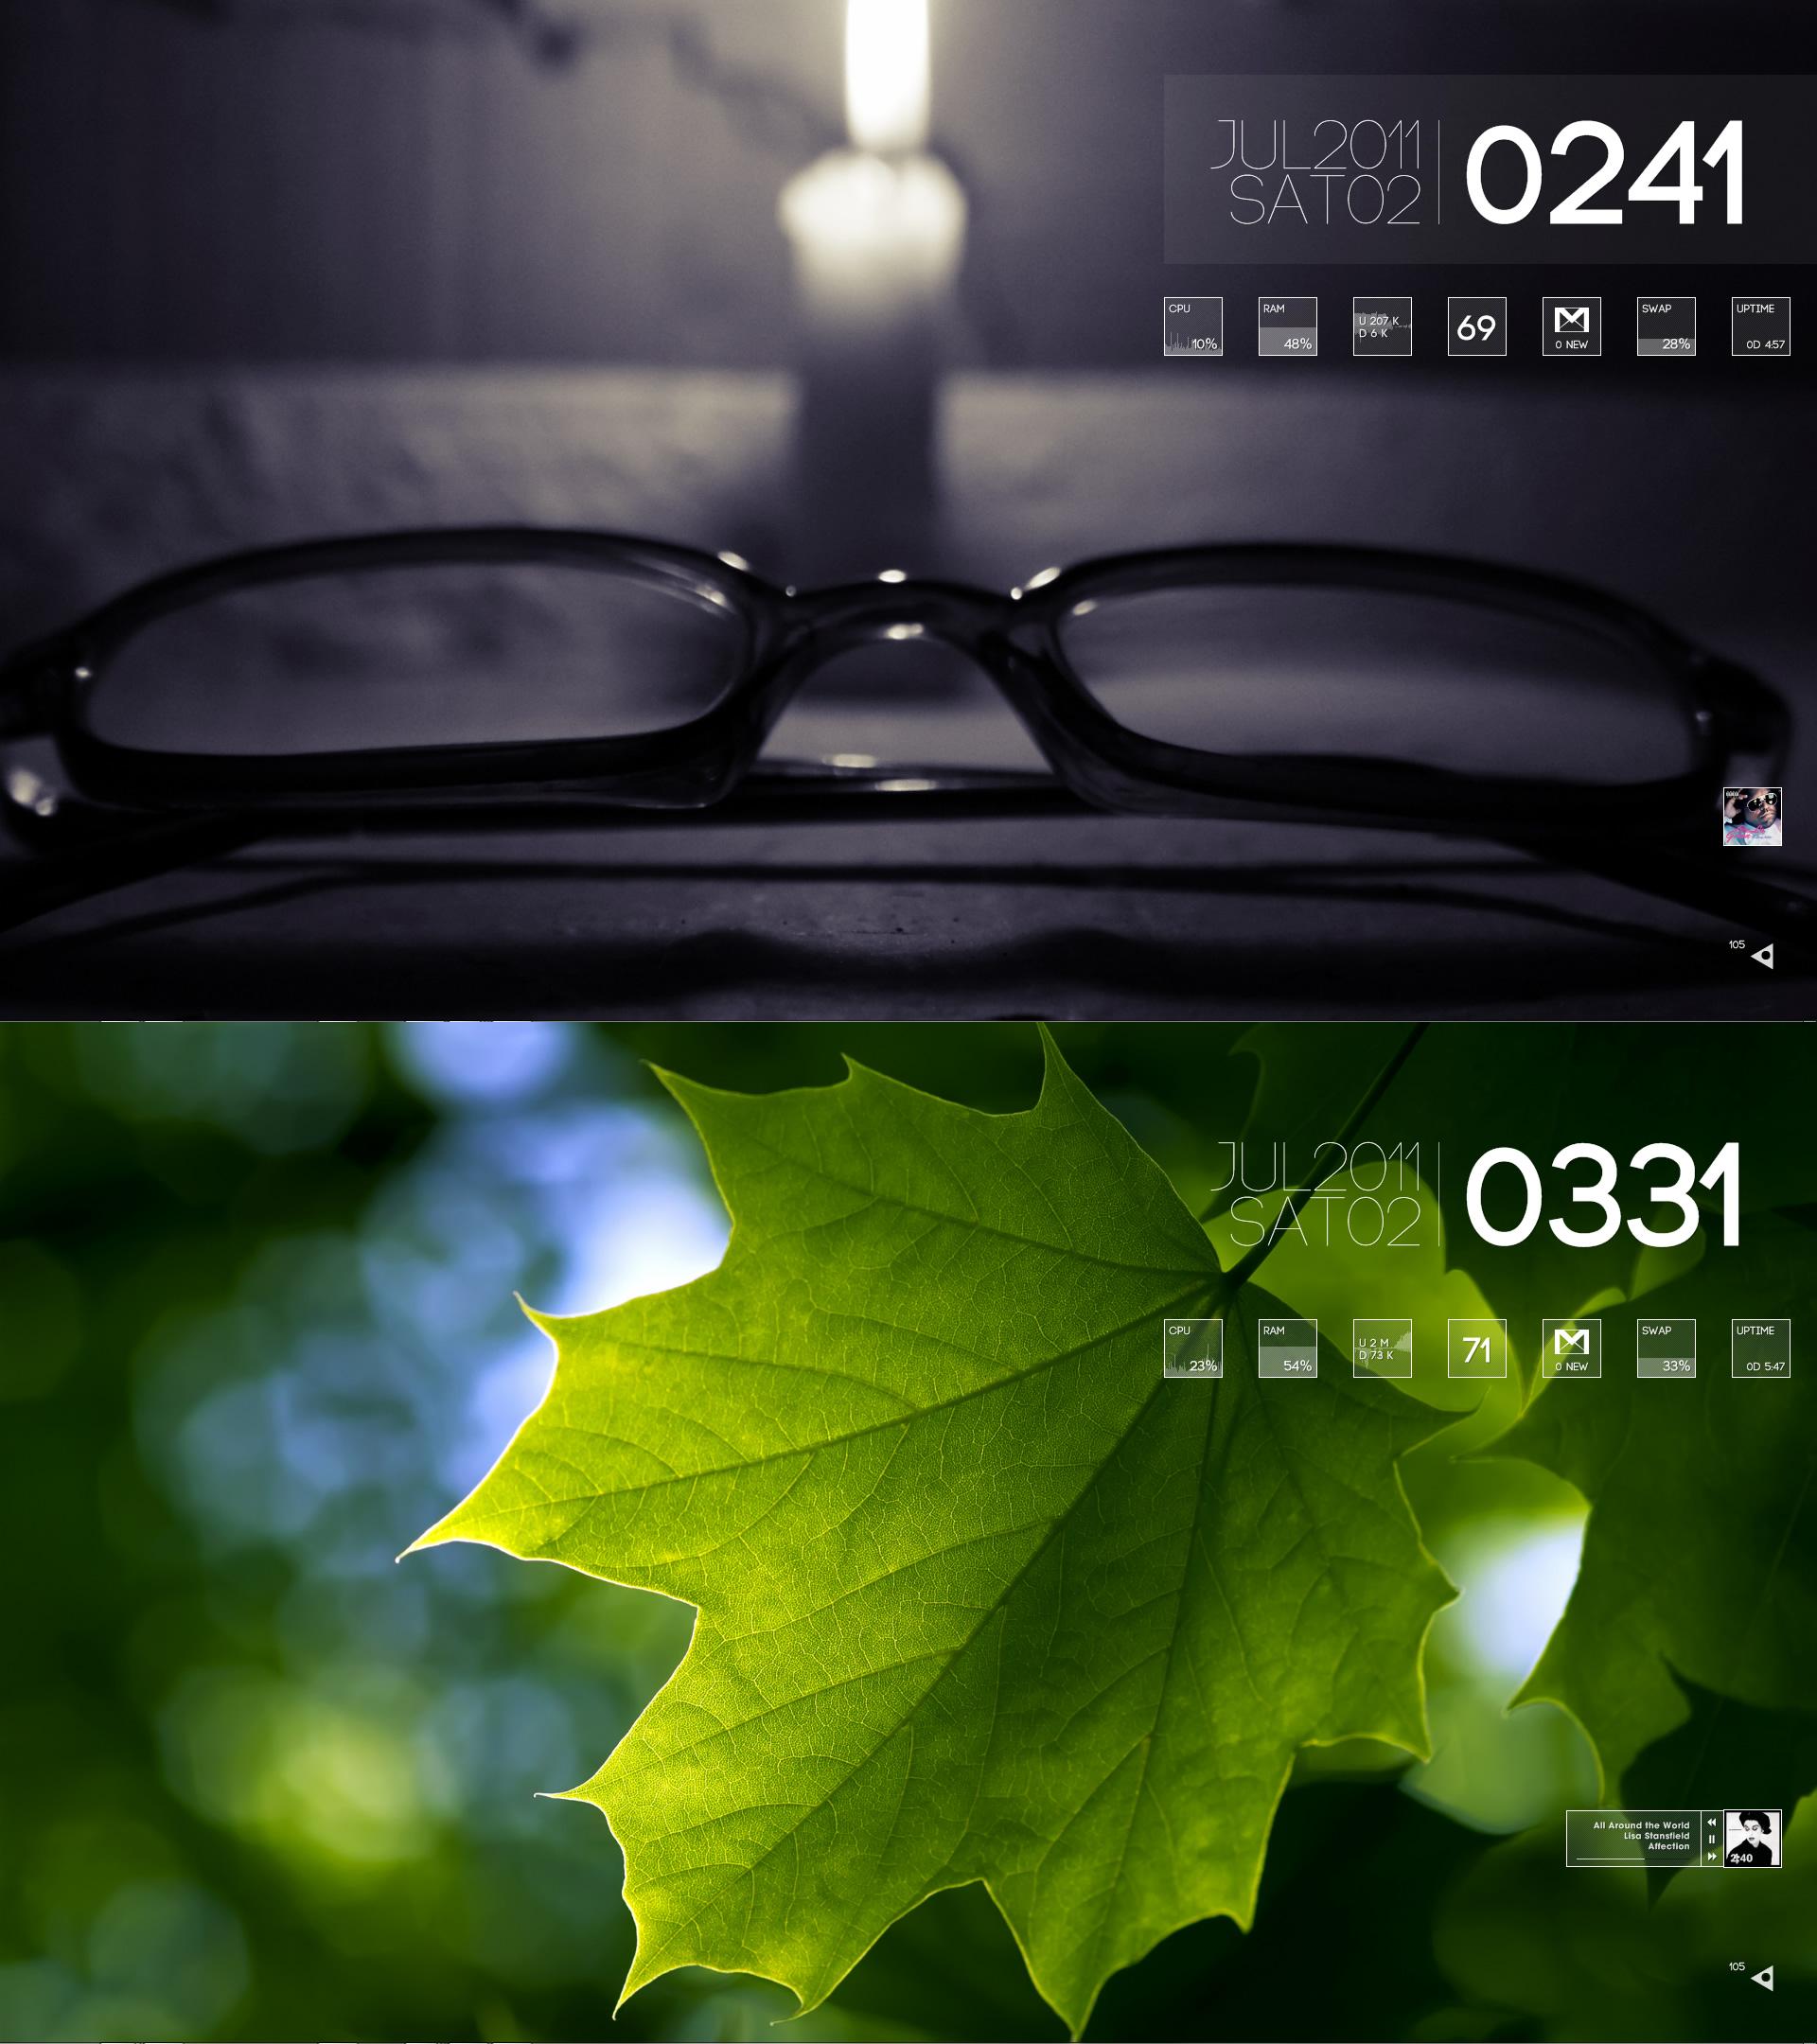 Desktop Encoded 070211 by lilshizzy